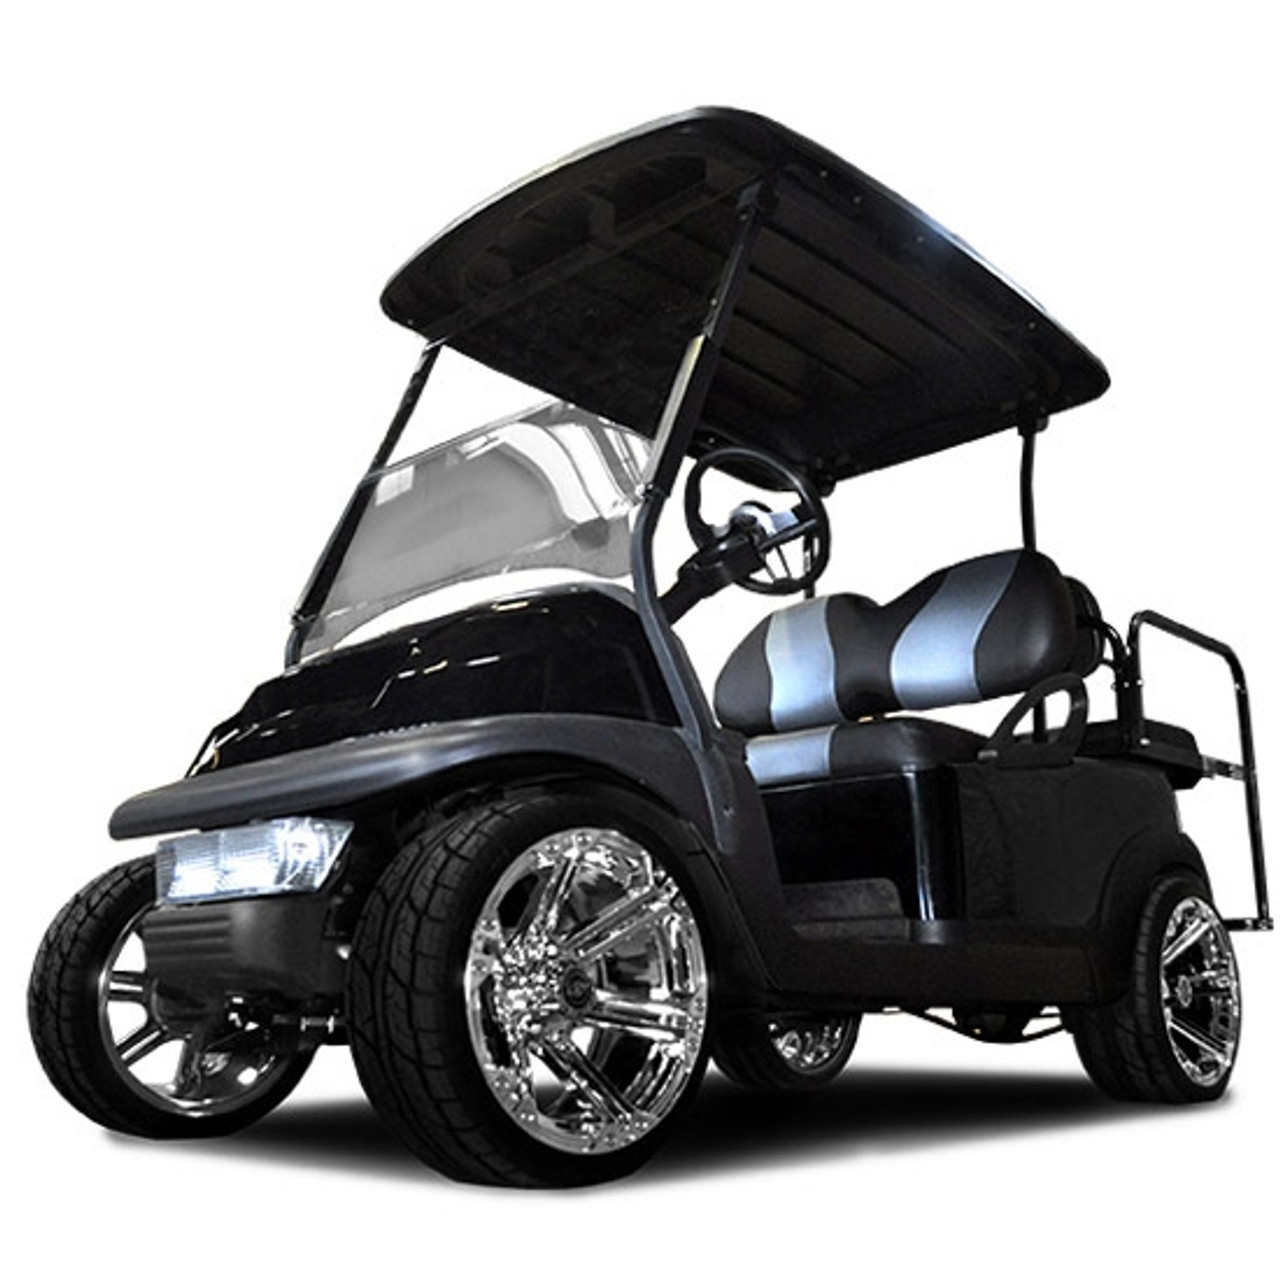 Golf cart lift kits best quality ezgo club car more club car lift kits solutioingenieria Gallery